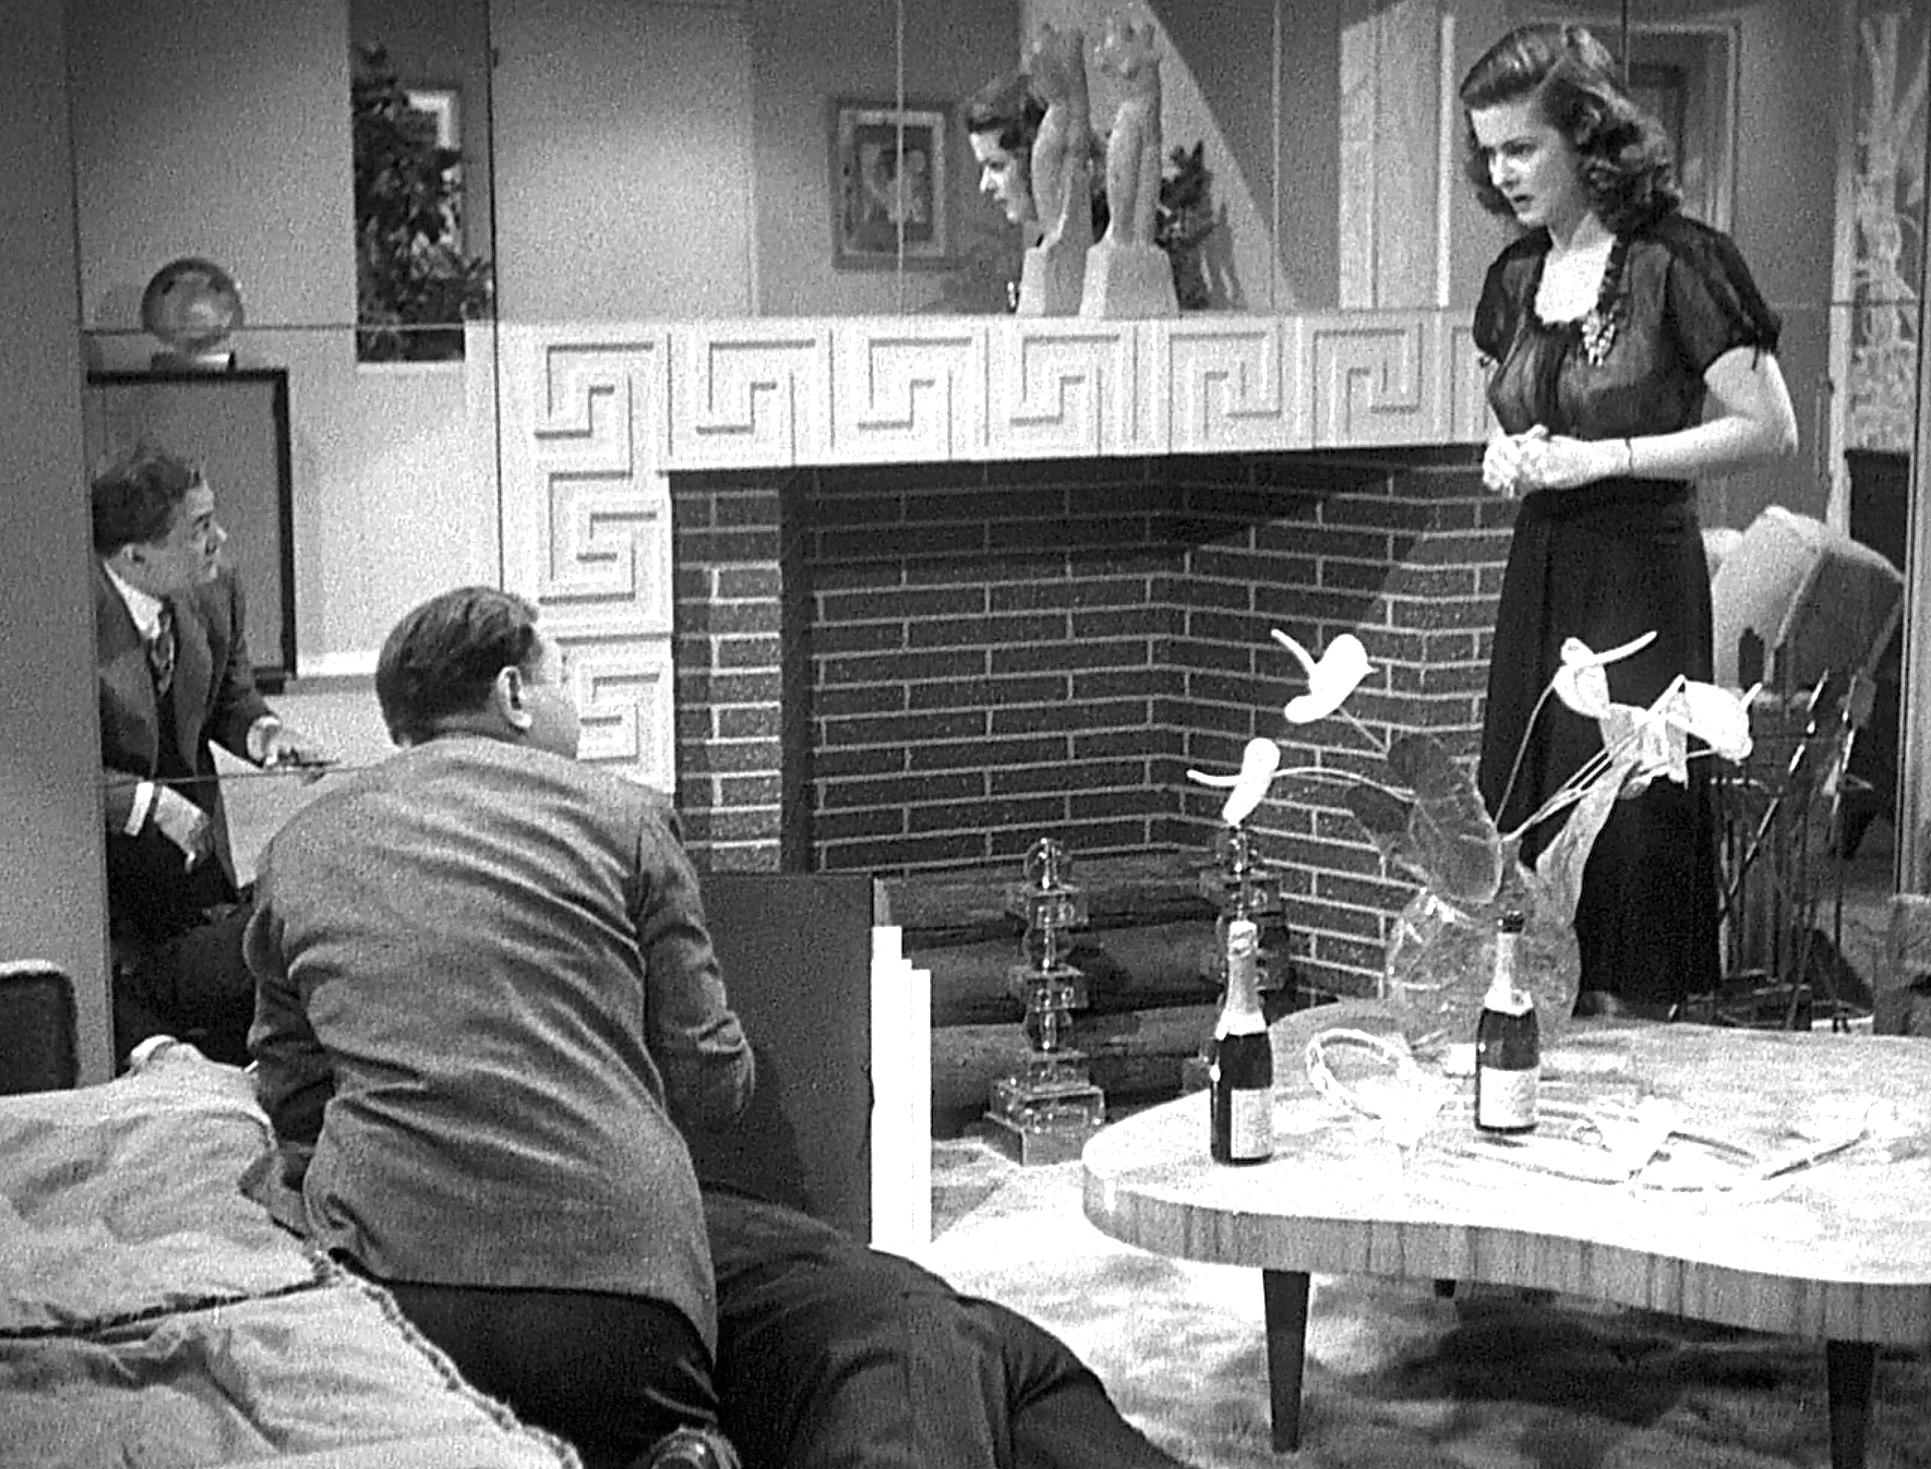 Edward G. Robinson, Joan Bennett, and Arthur Loft in The Woman in the Window (1944)